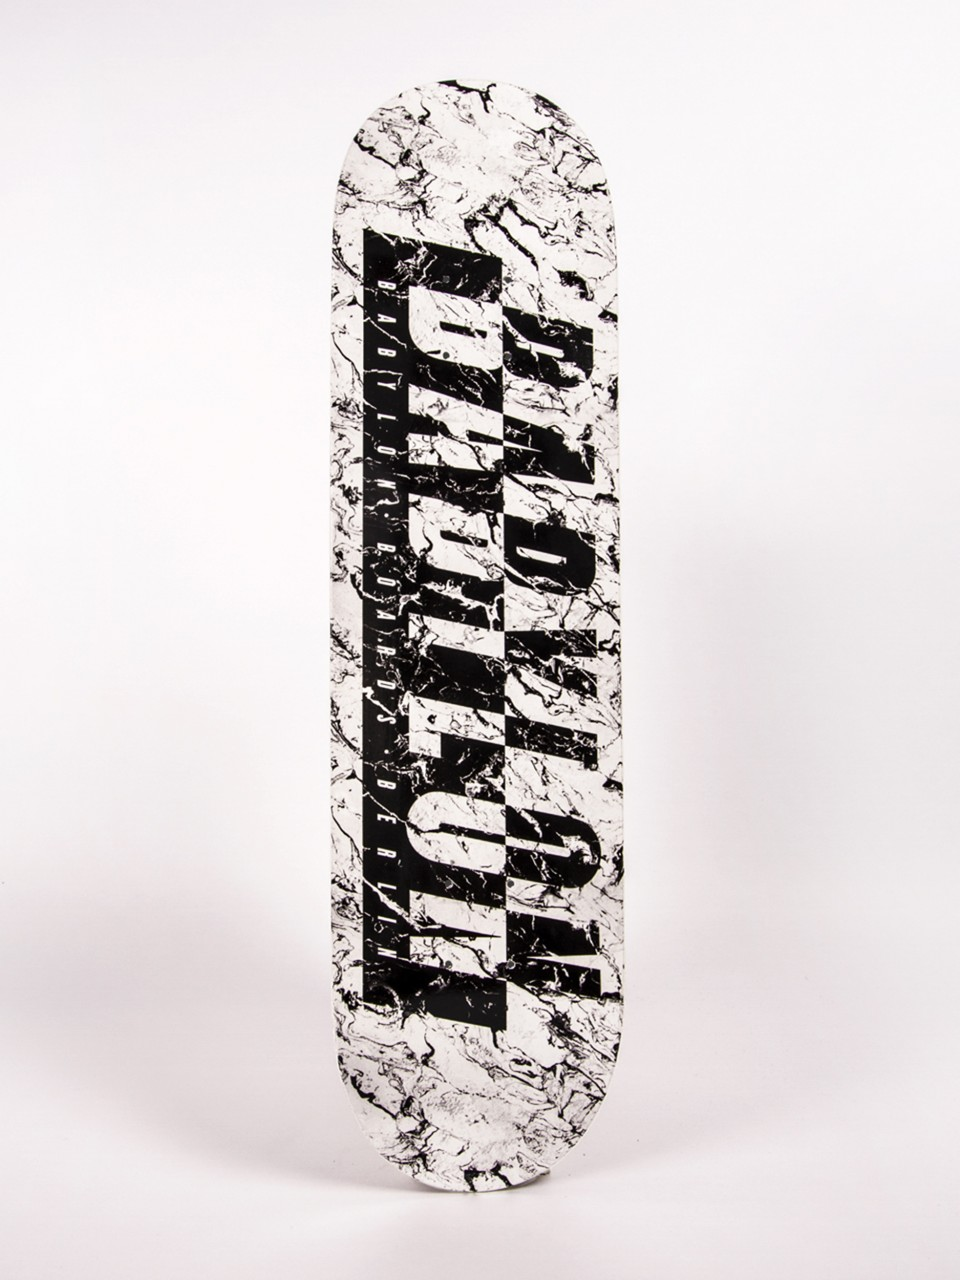 babylon, berlin, skate, boarddesign, kreuzberg, ice cube, westcoast, gangsta, hommage, 90s, vintage, nwa,